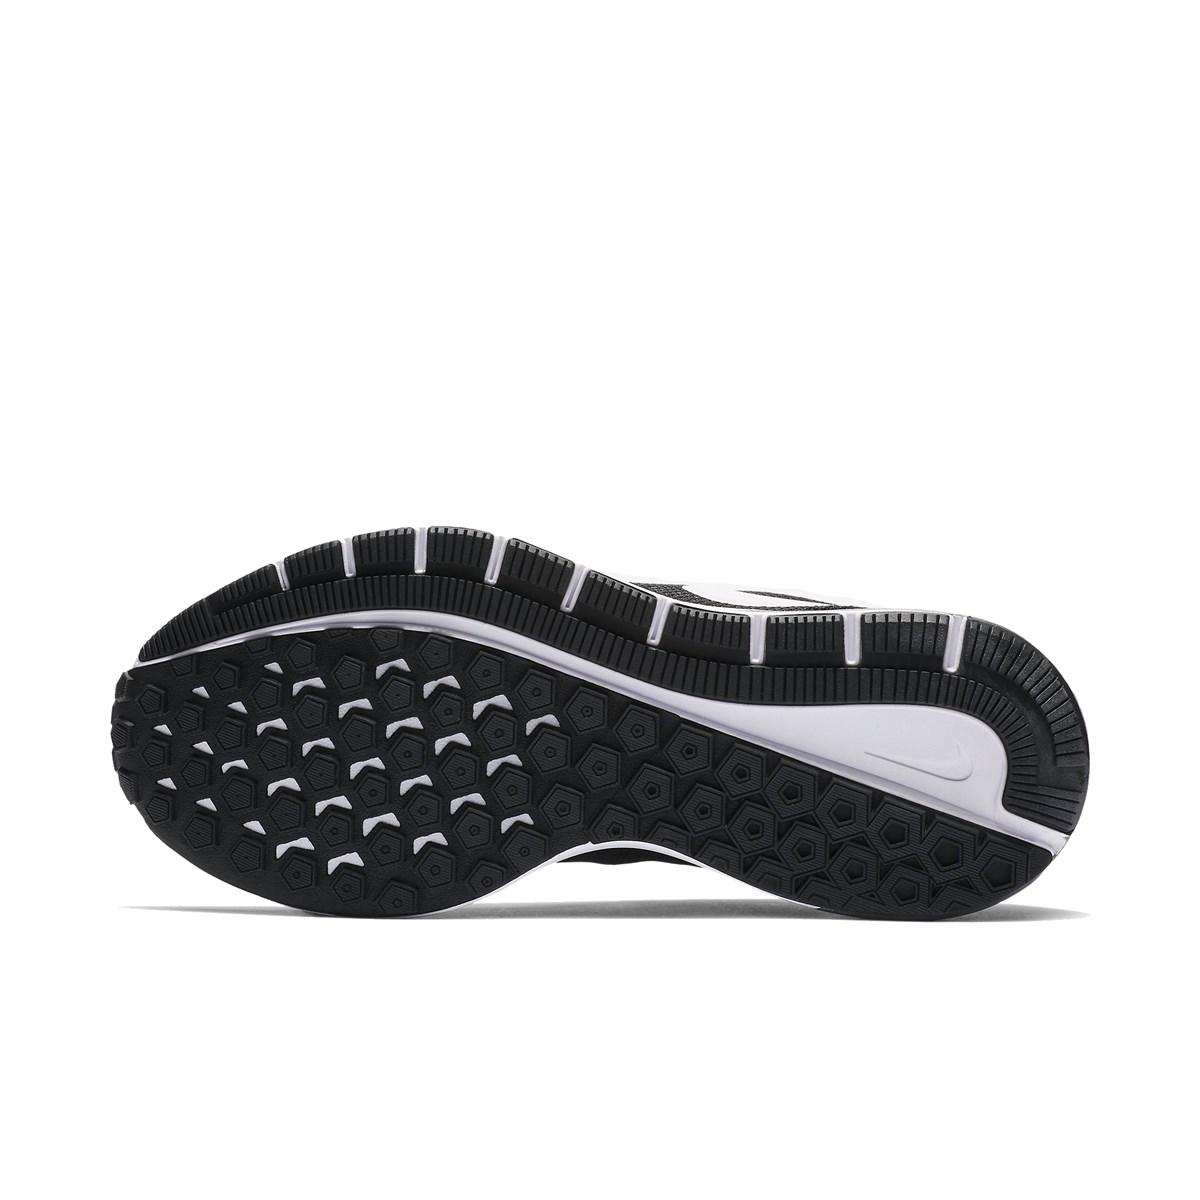 Air Zoom Structure 22 Kadın Siyah Koşu Ayakkabısı